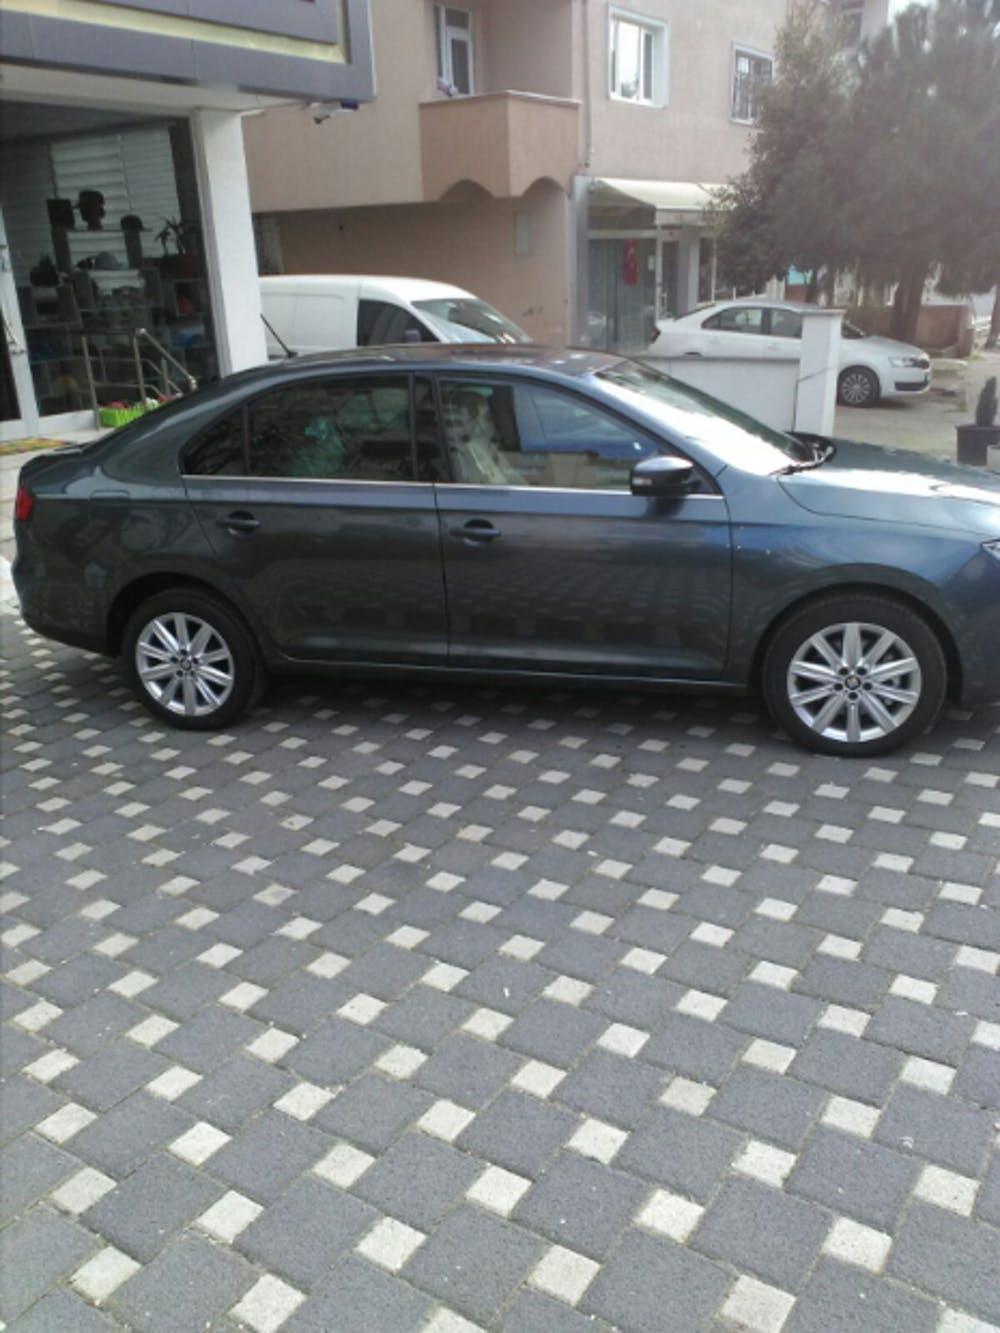 SEAT Toledo 2017 Model Benzin Otomatik Vites Kiralik Araç - 1711